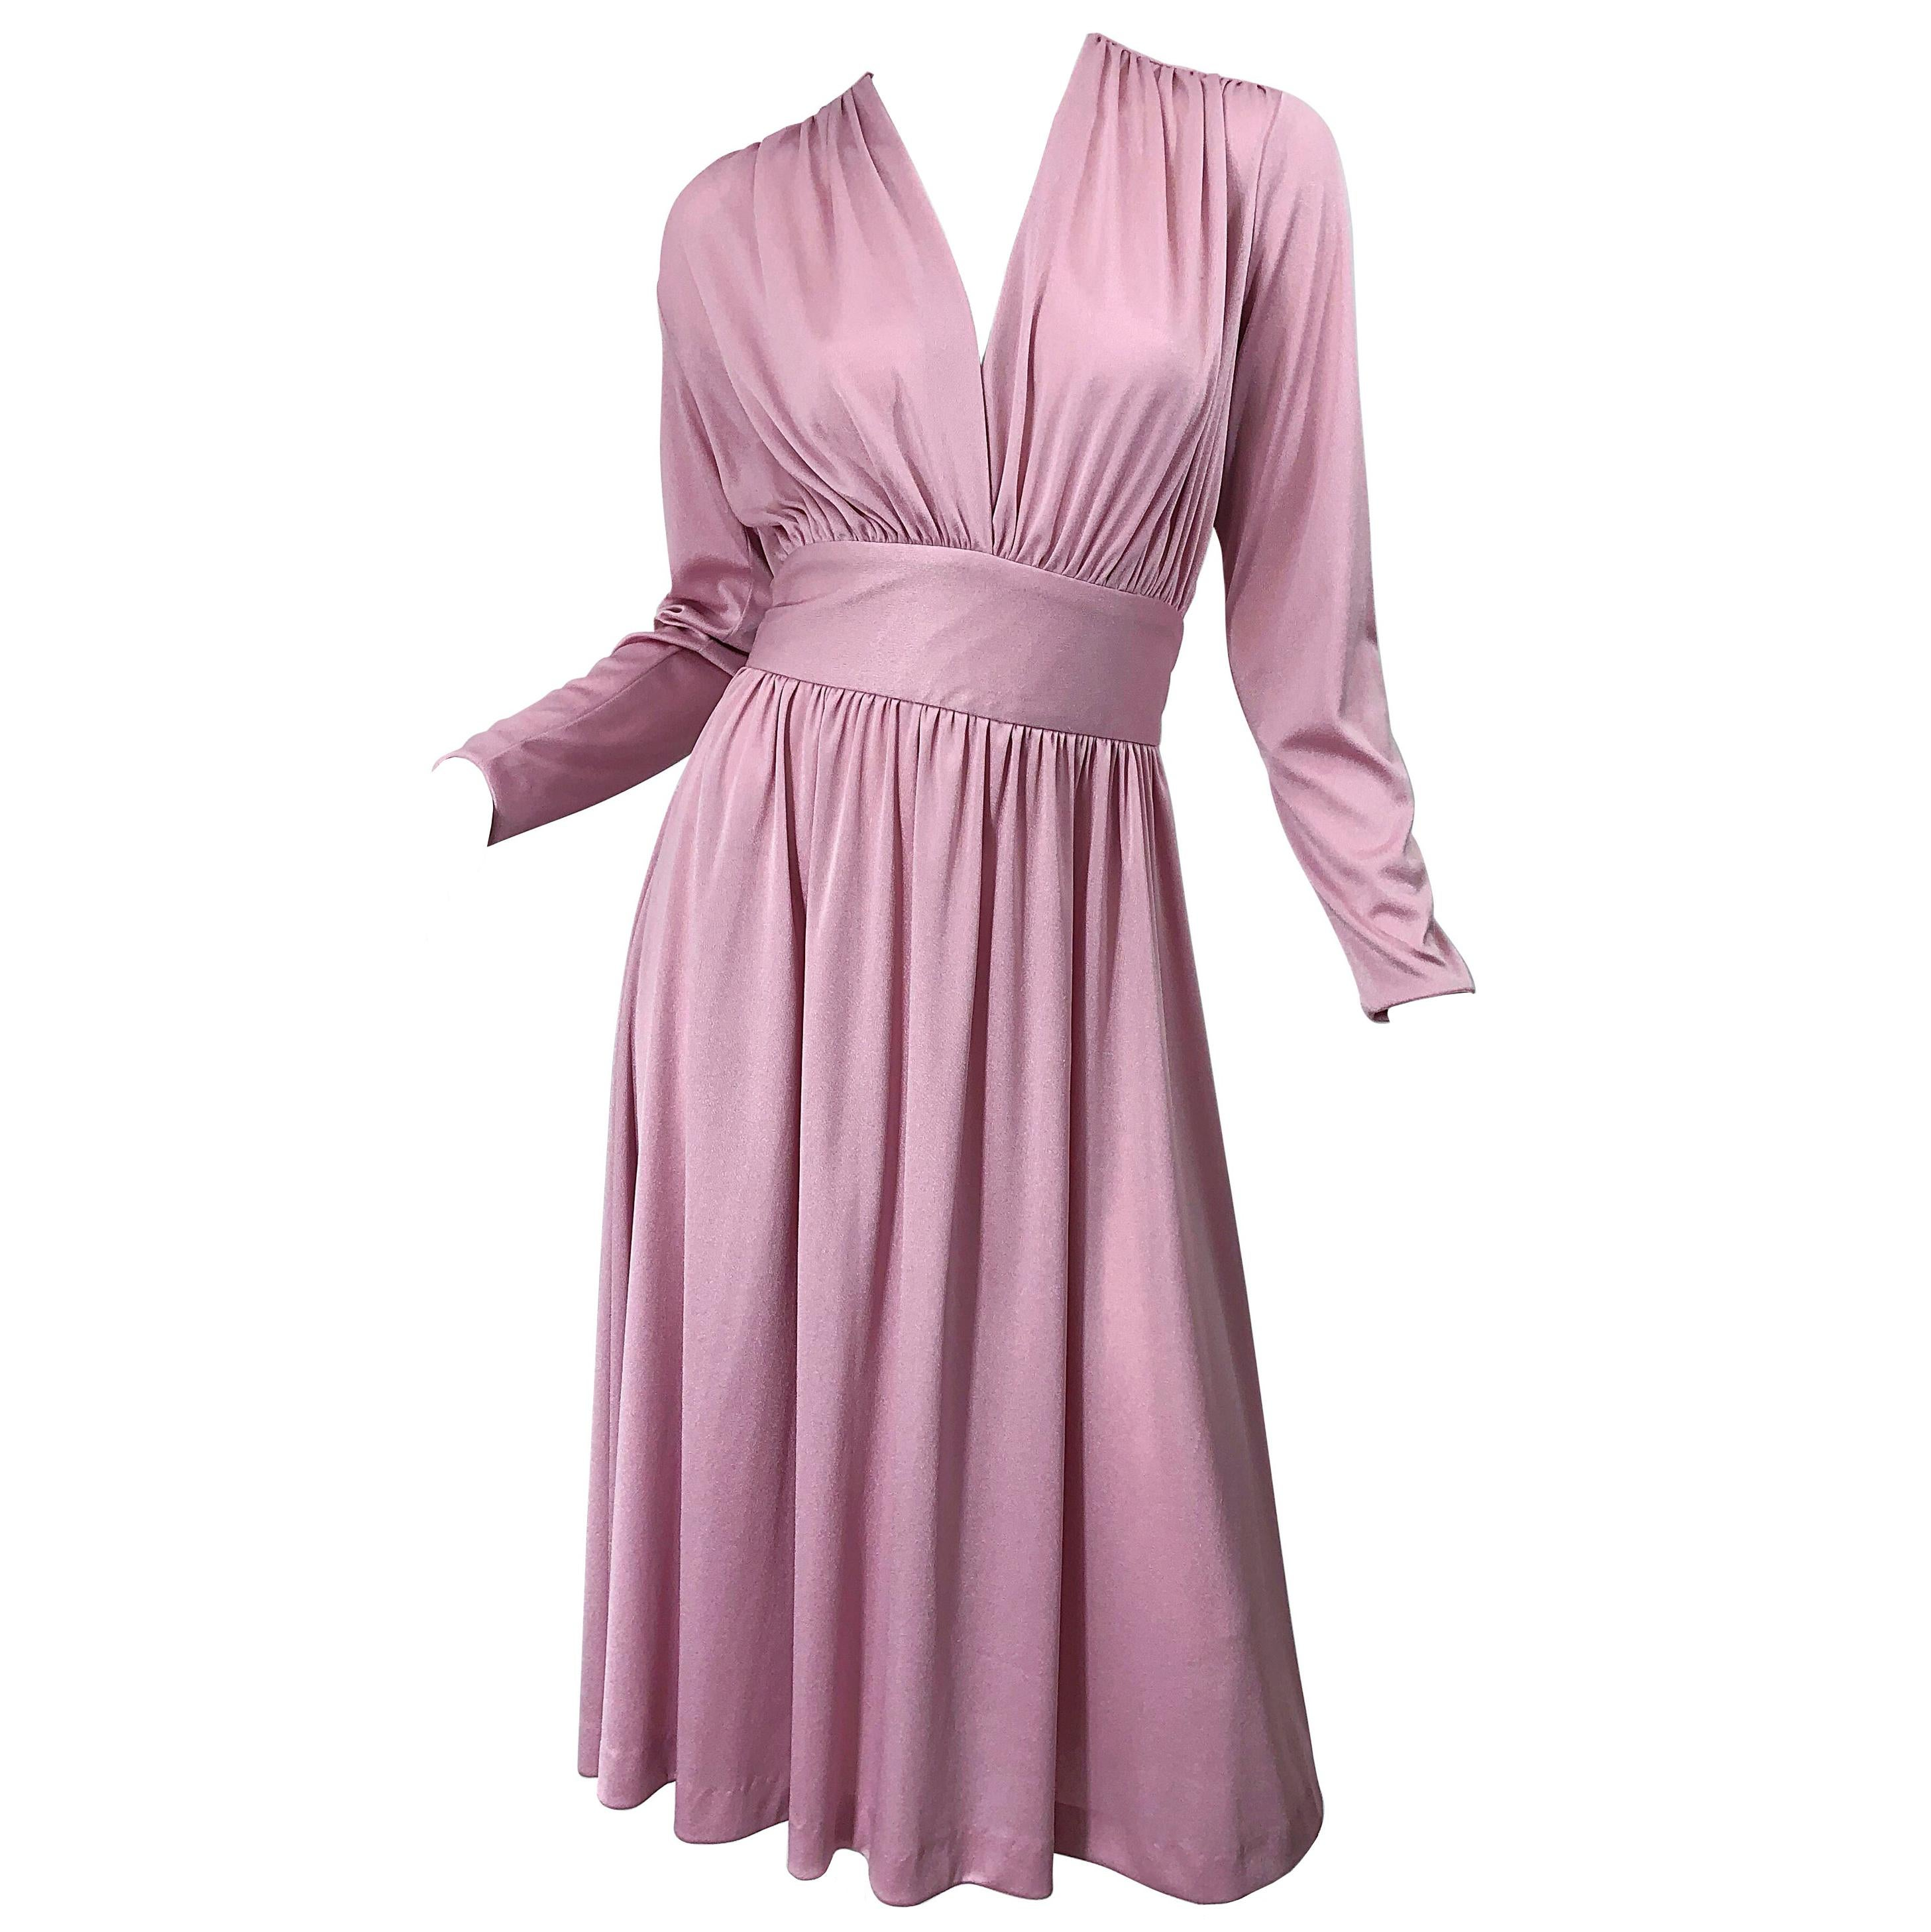 Joy Stevens 1970s Pink Mauve Dusty Rose Long Sleeve Disco Vintage 70s Dress